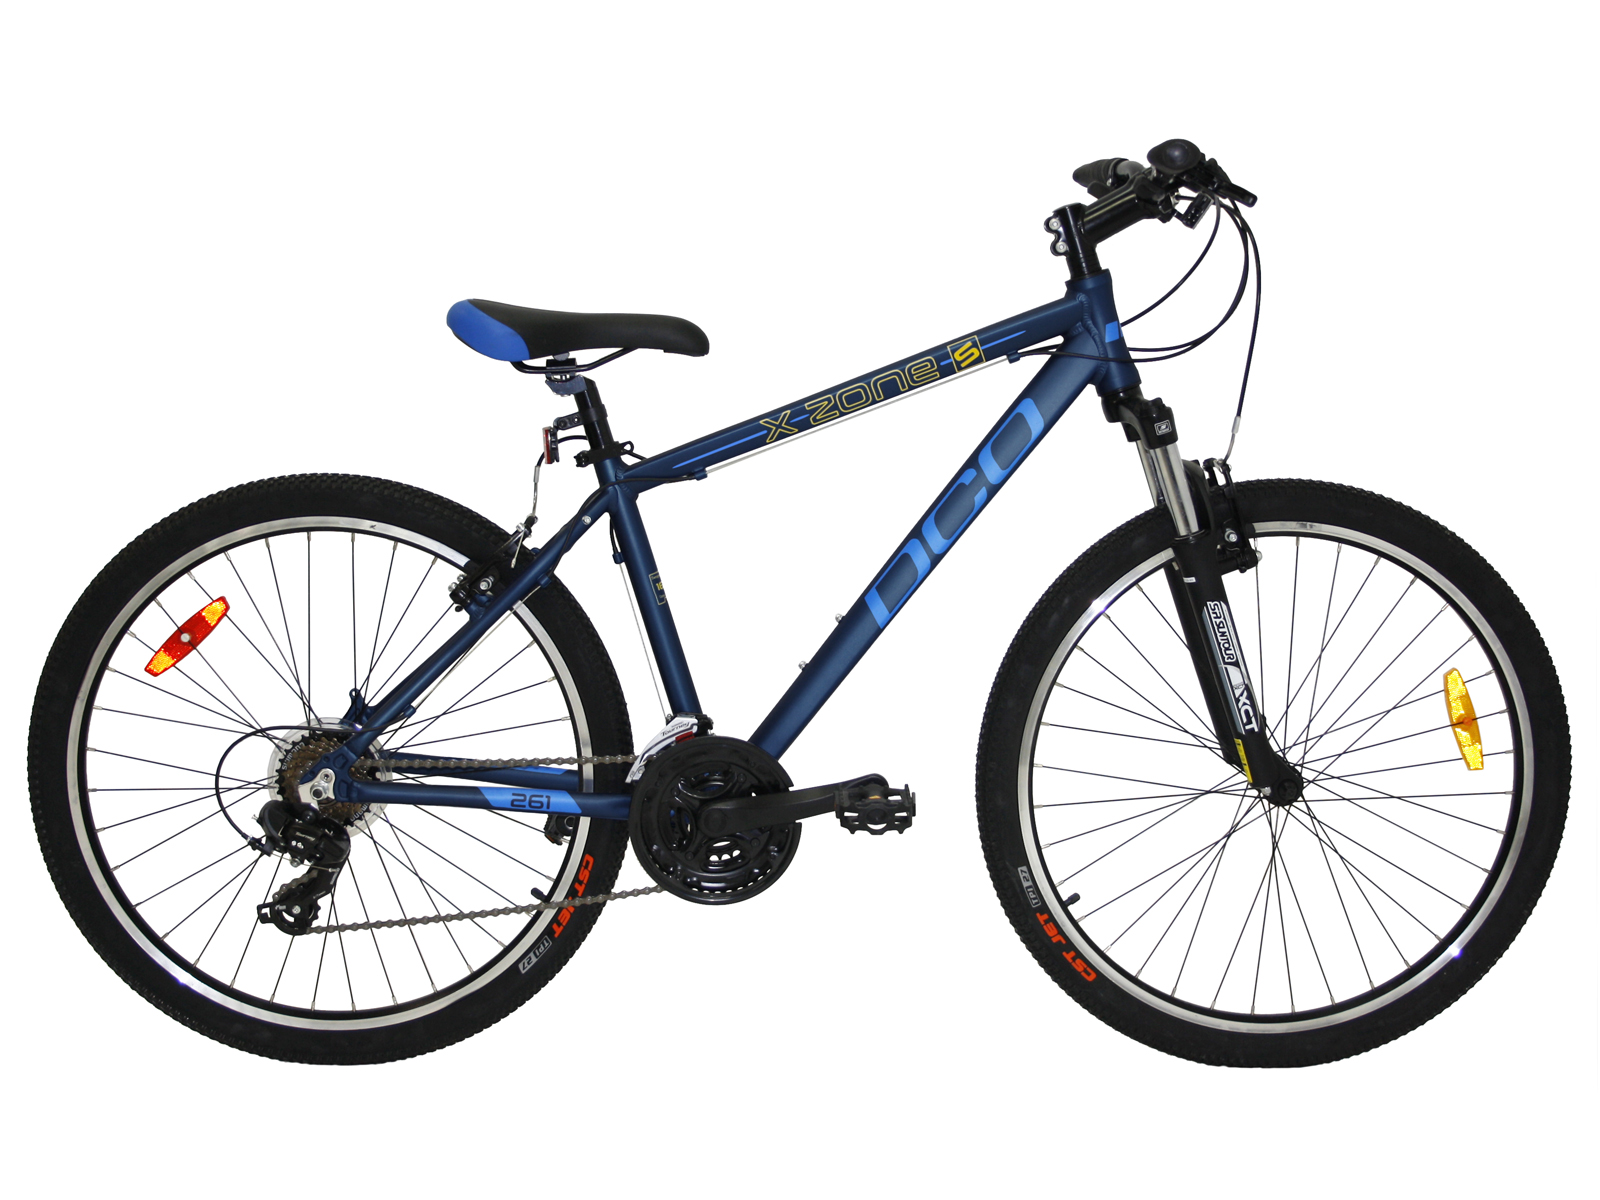 DCO X-Zone 26in Mountain Bike